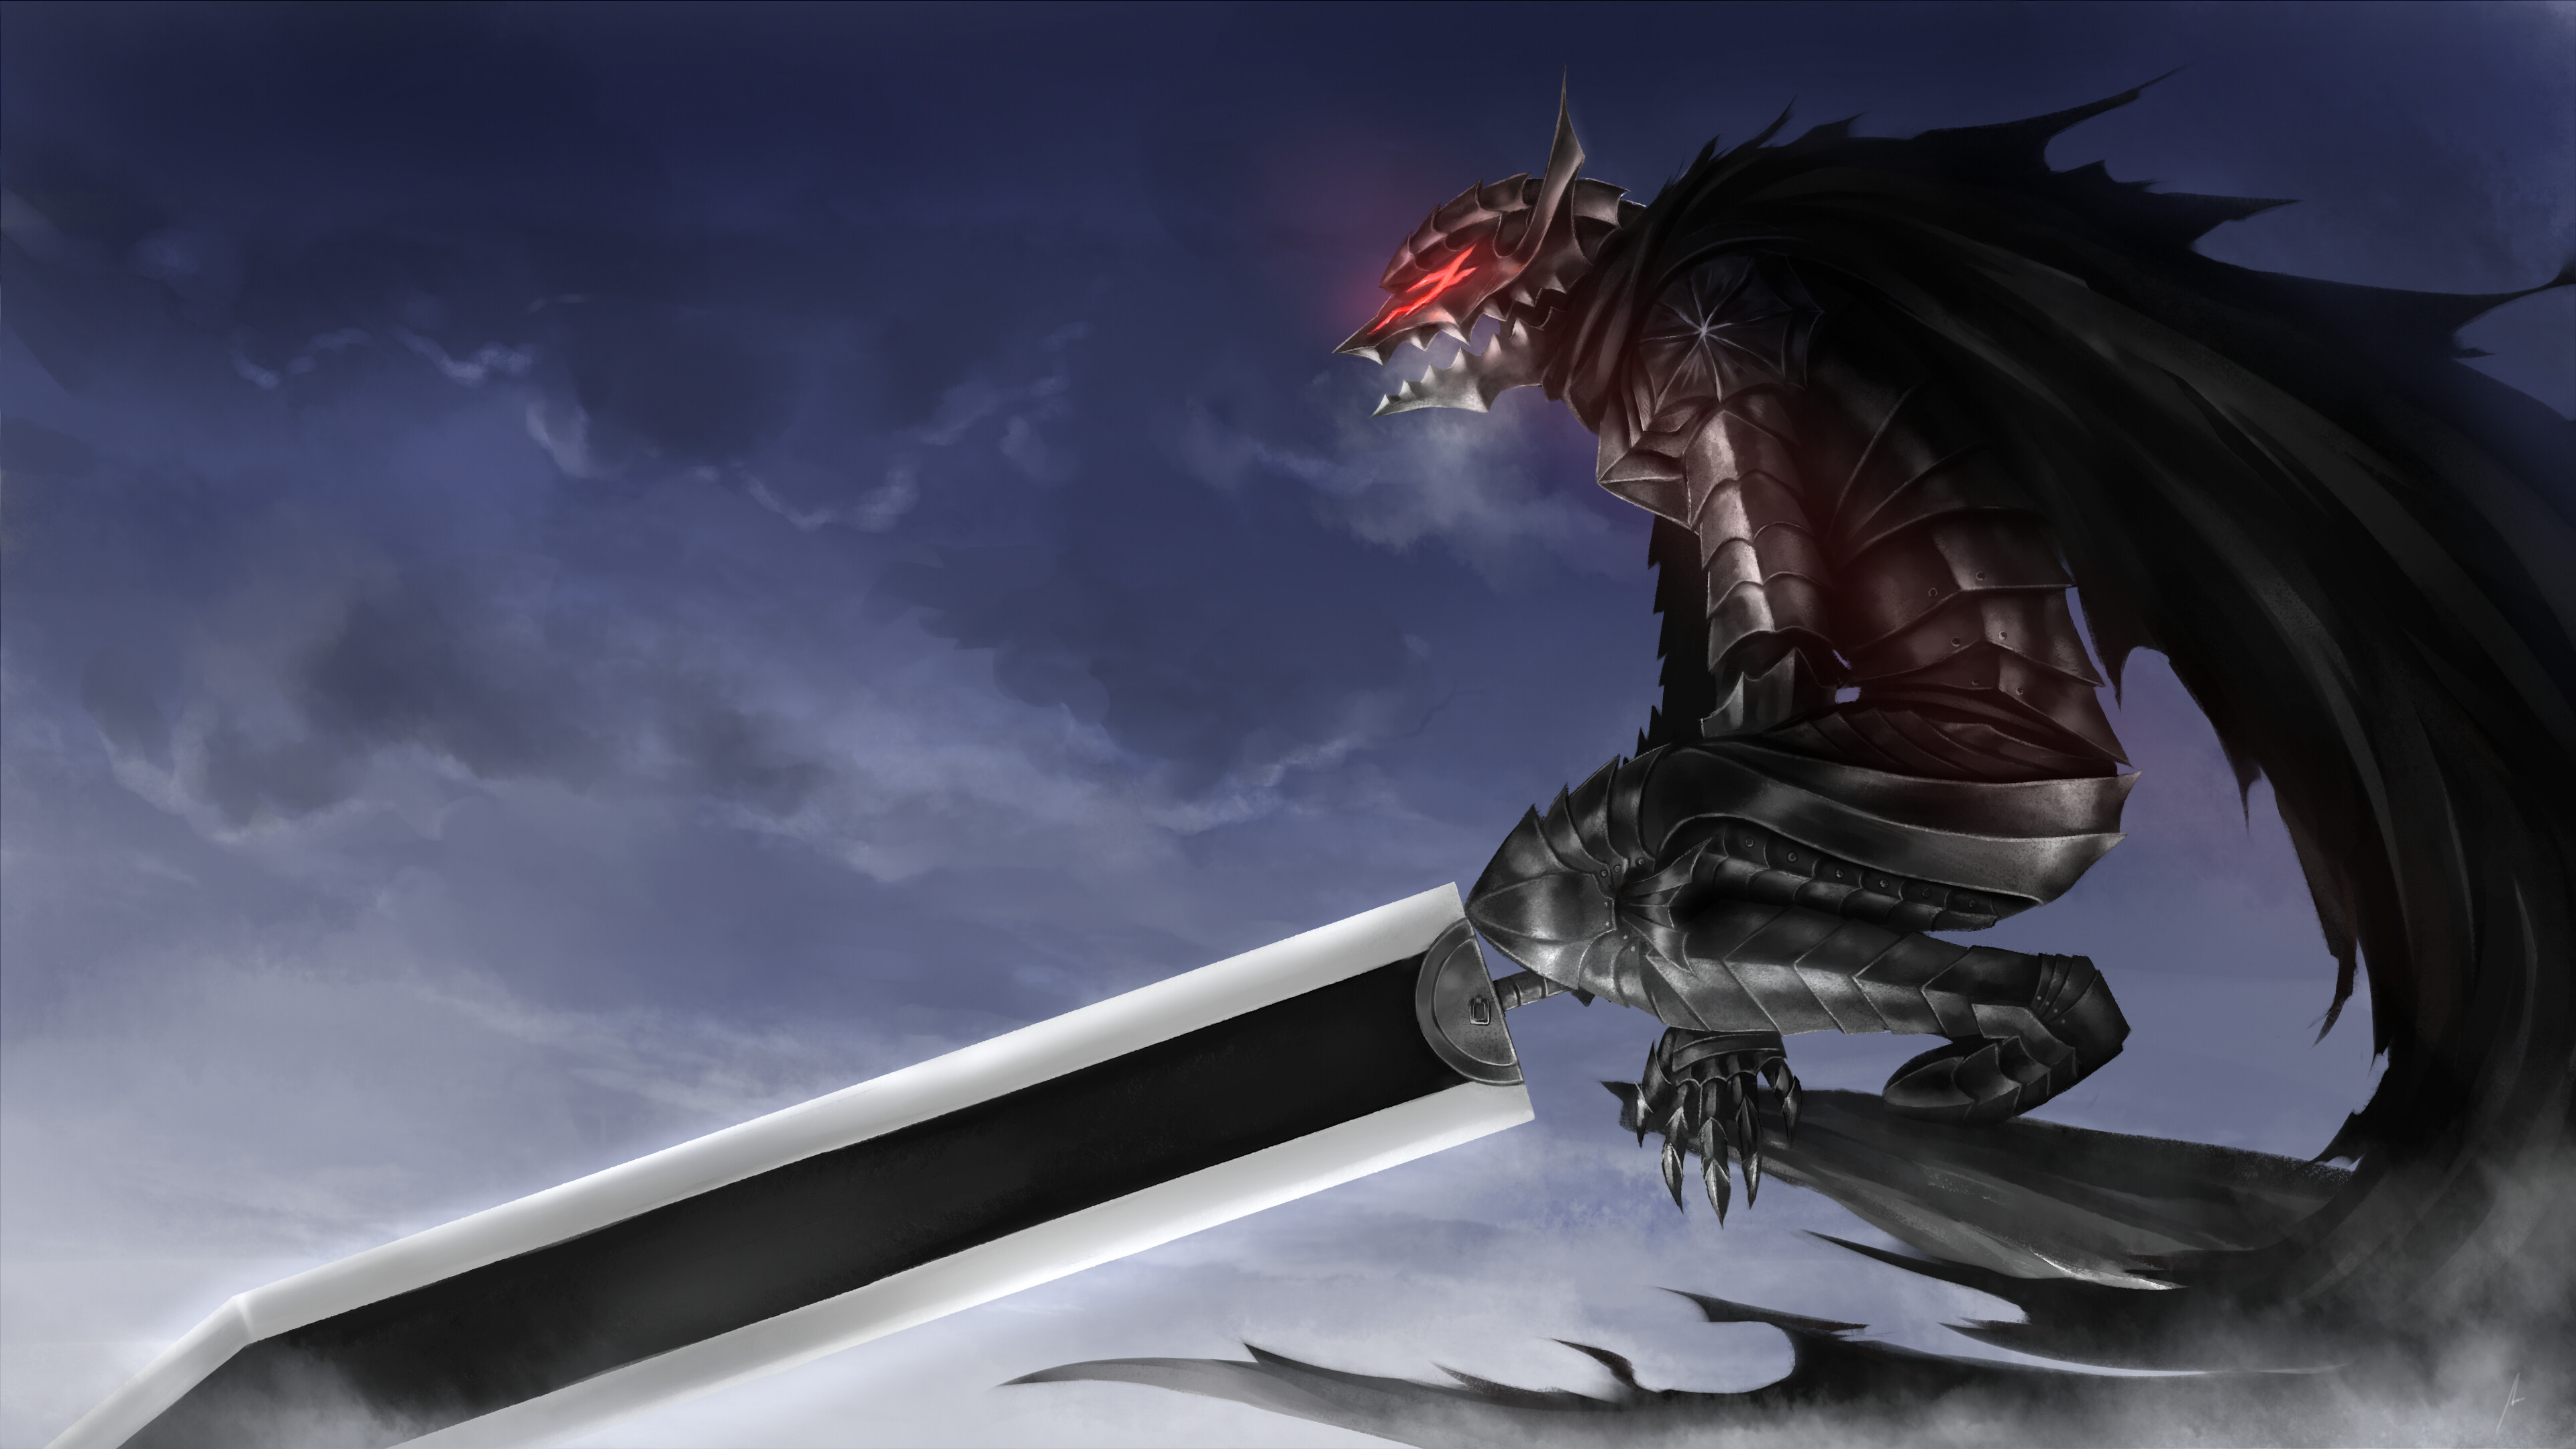 Res: 3840x2160, Anime - Berserk Guts (Berserk) Wallpaper